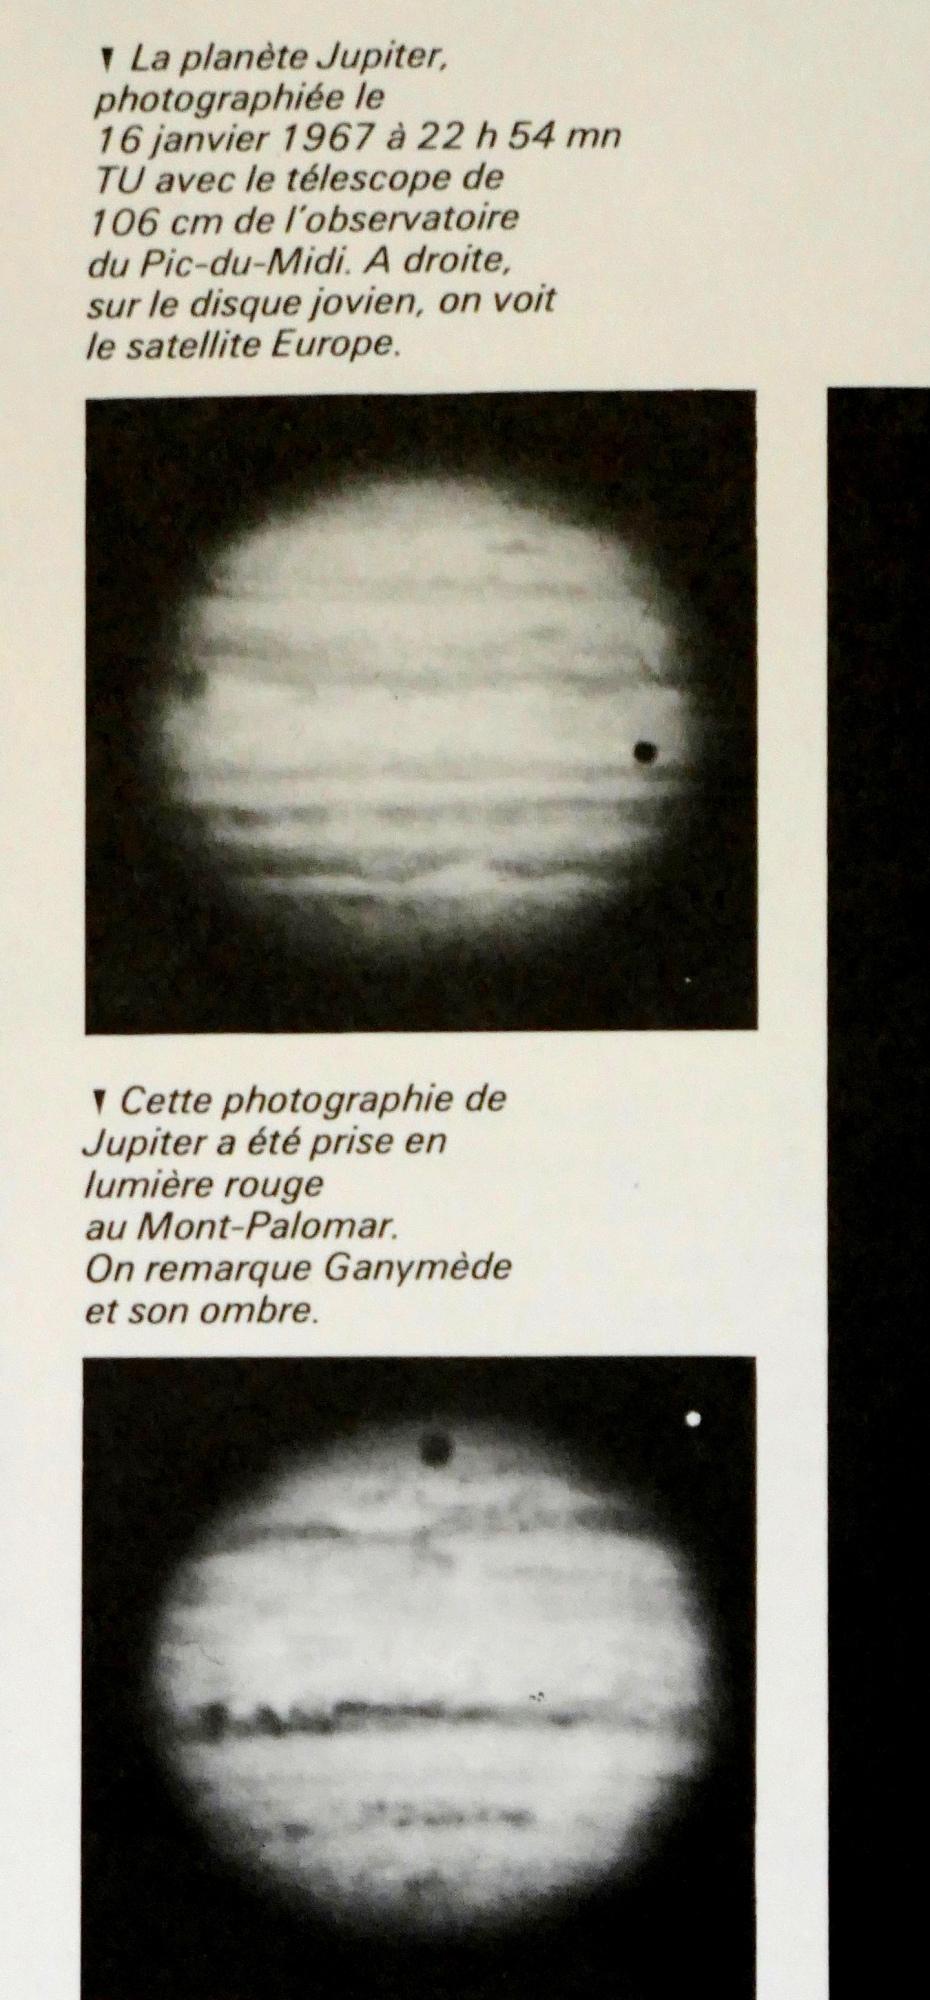 600eb3b57cea0_Cosmos-encyclopdie_lexploration-des-plantes_1972_Jupiter.thumb.JPG.e42f3062a90da0813fb203473f897c6f.JPG